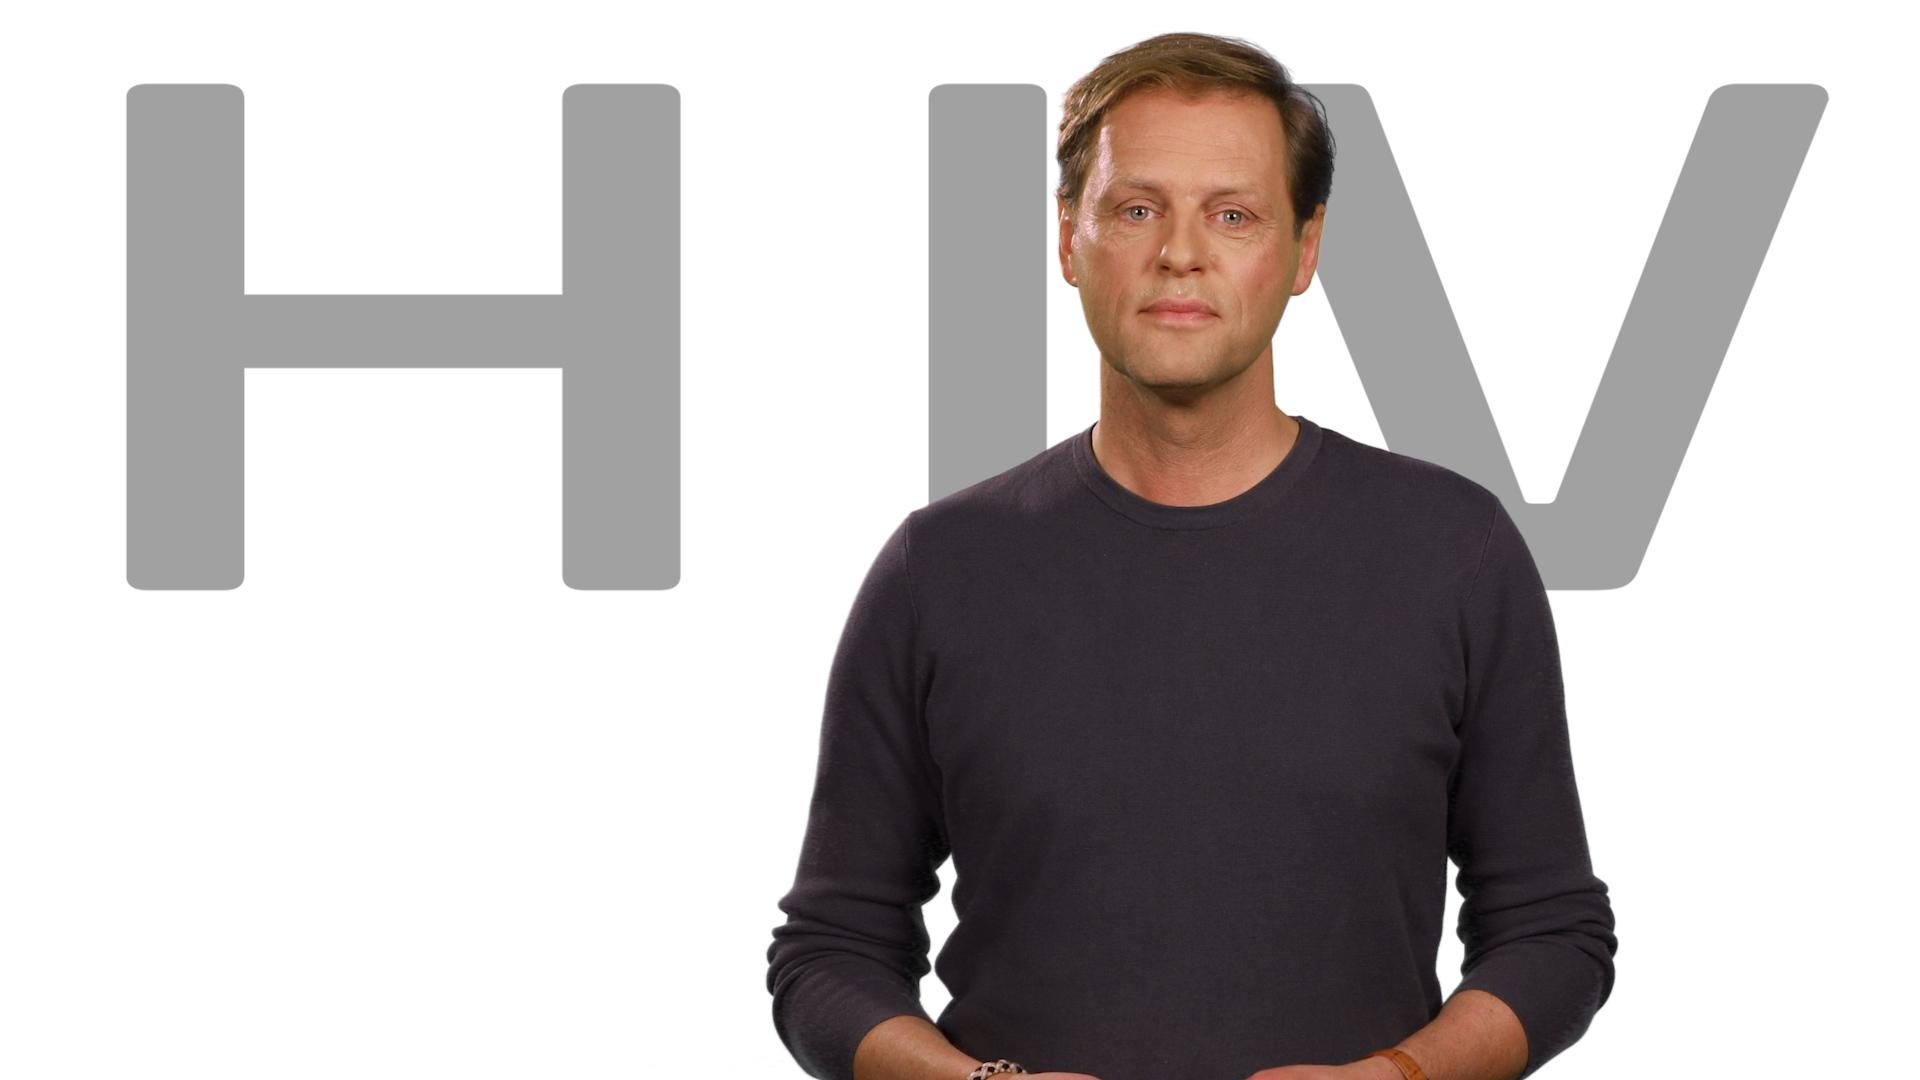 Ik Heb Hiv Thuisarts